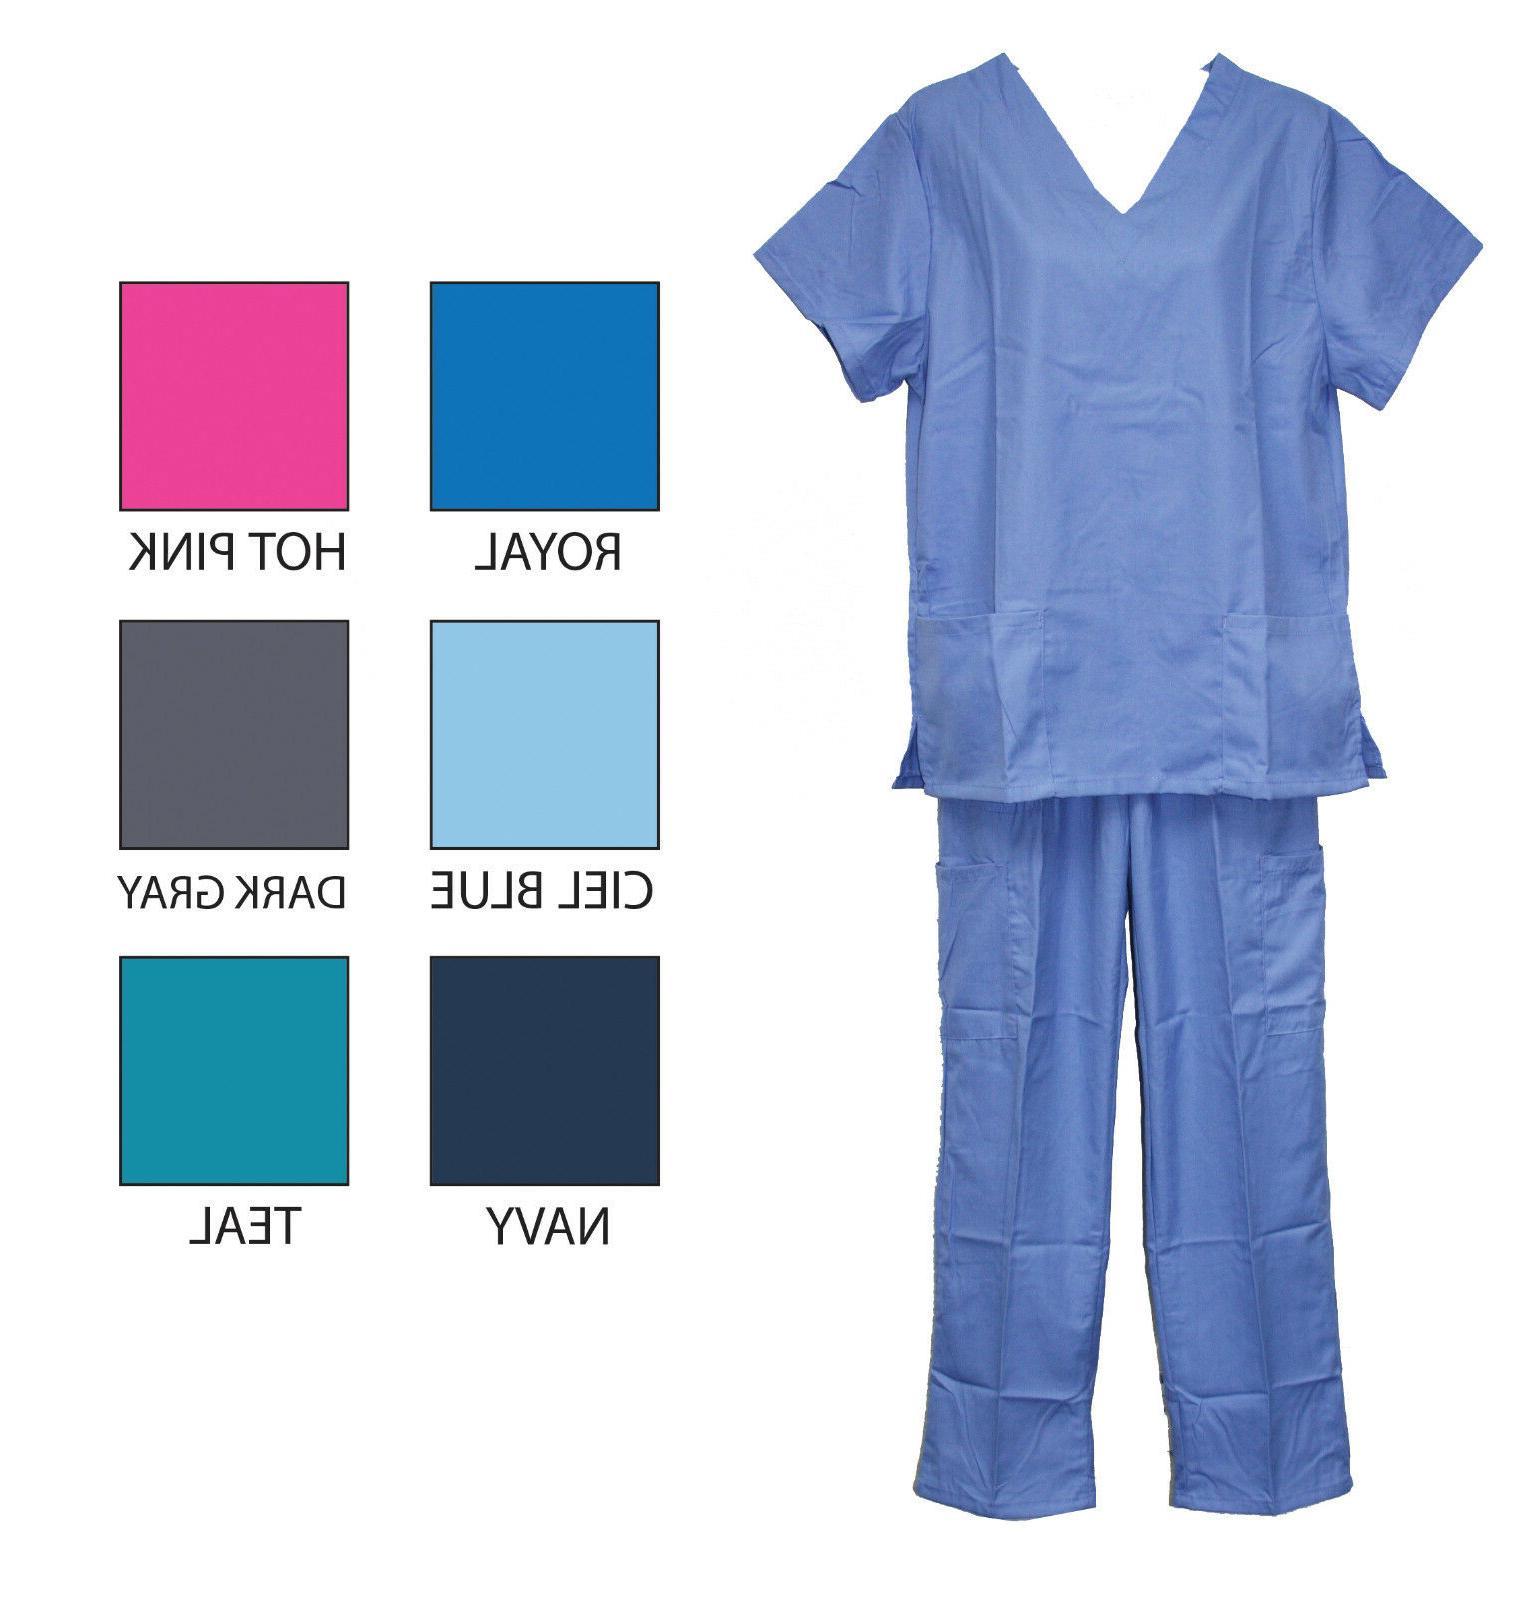 Unisex Women's Men's Medical Uniform Scrubs Sets Tops Pants